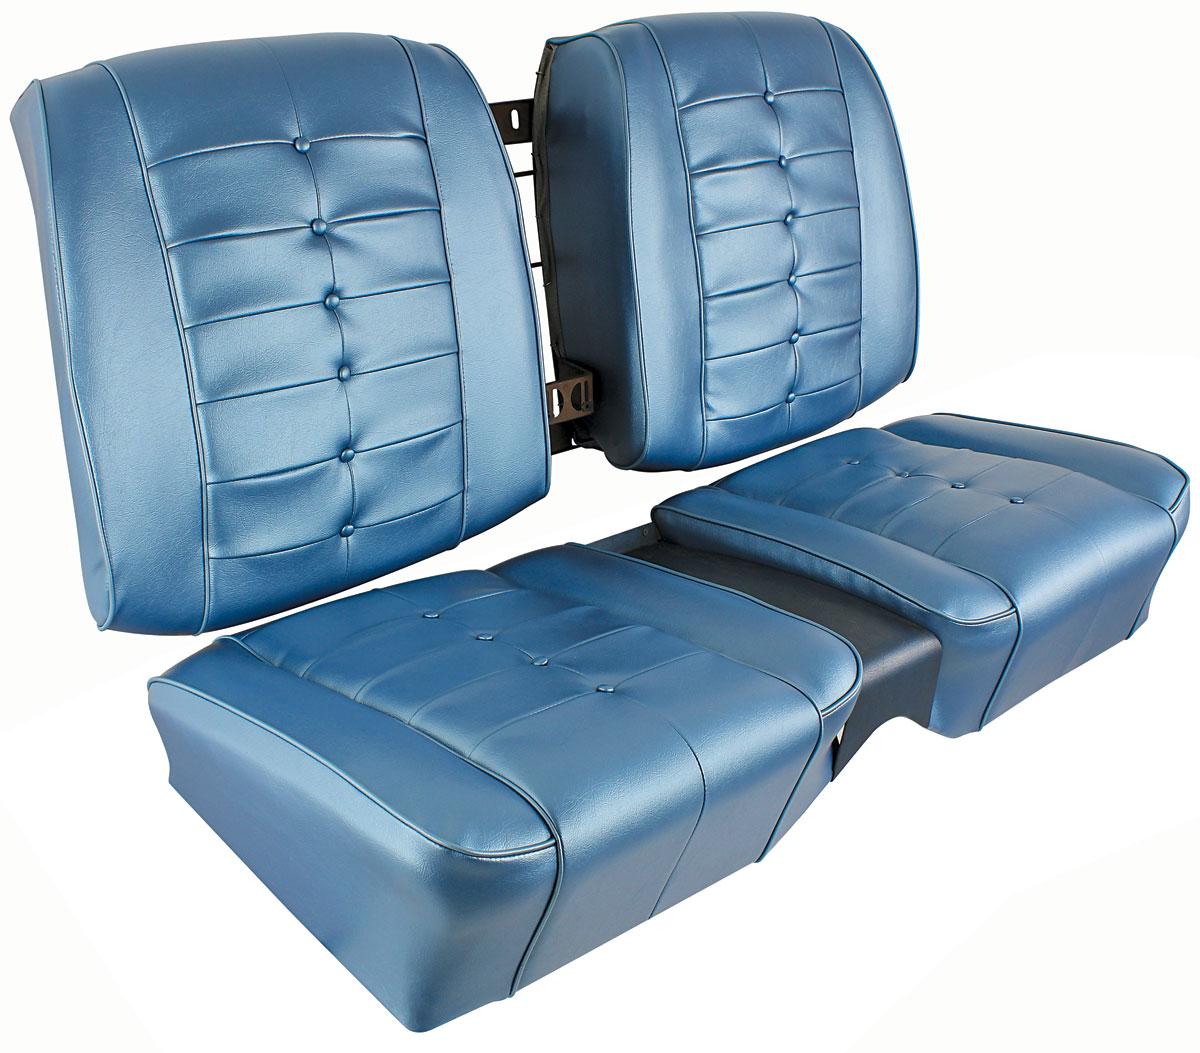 Seat Upholstery, 1963 Riviera, Rear Buckets